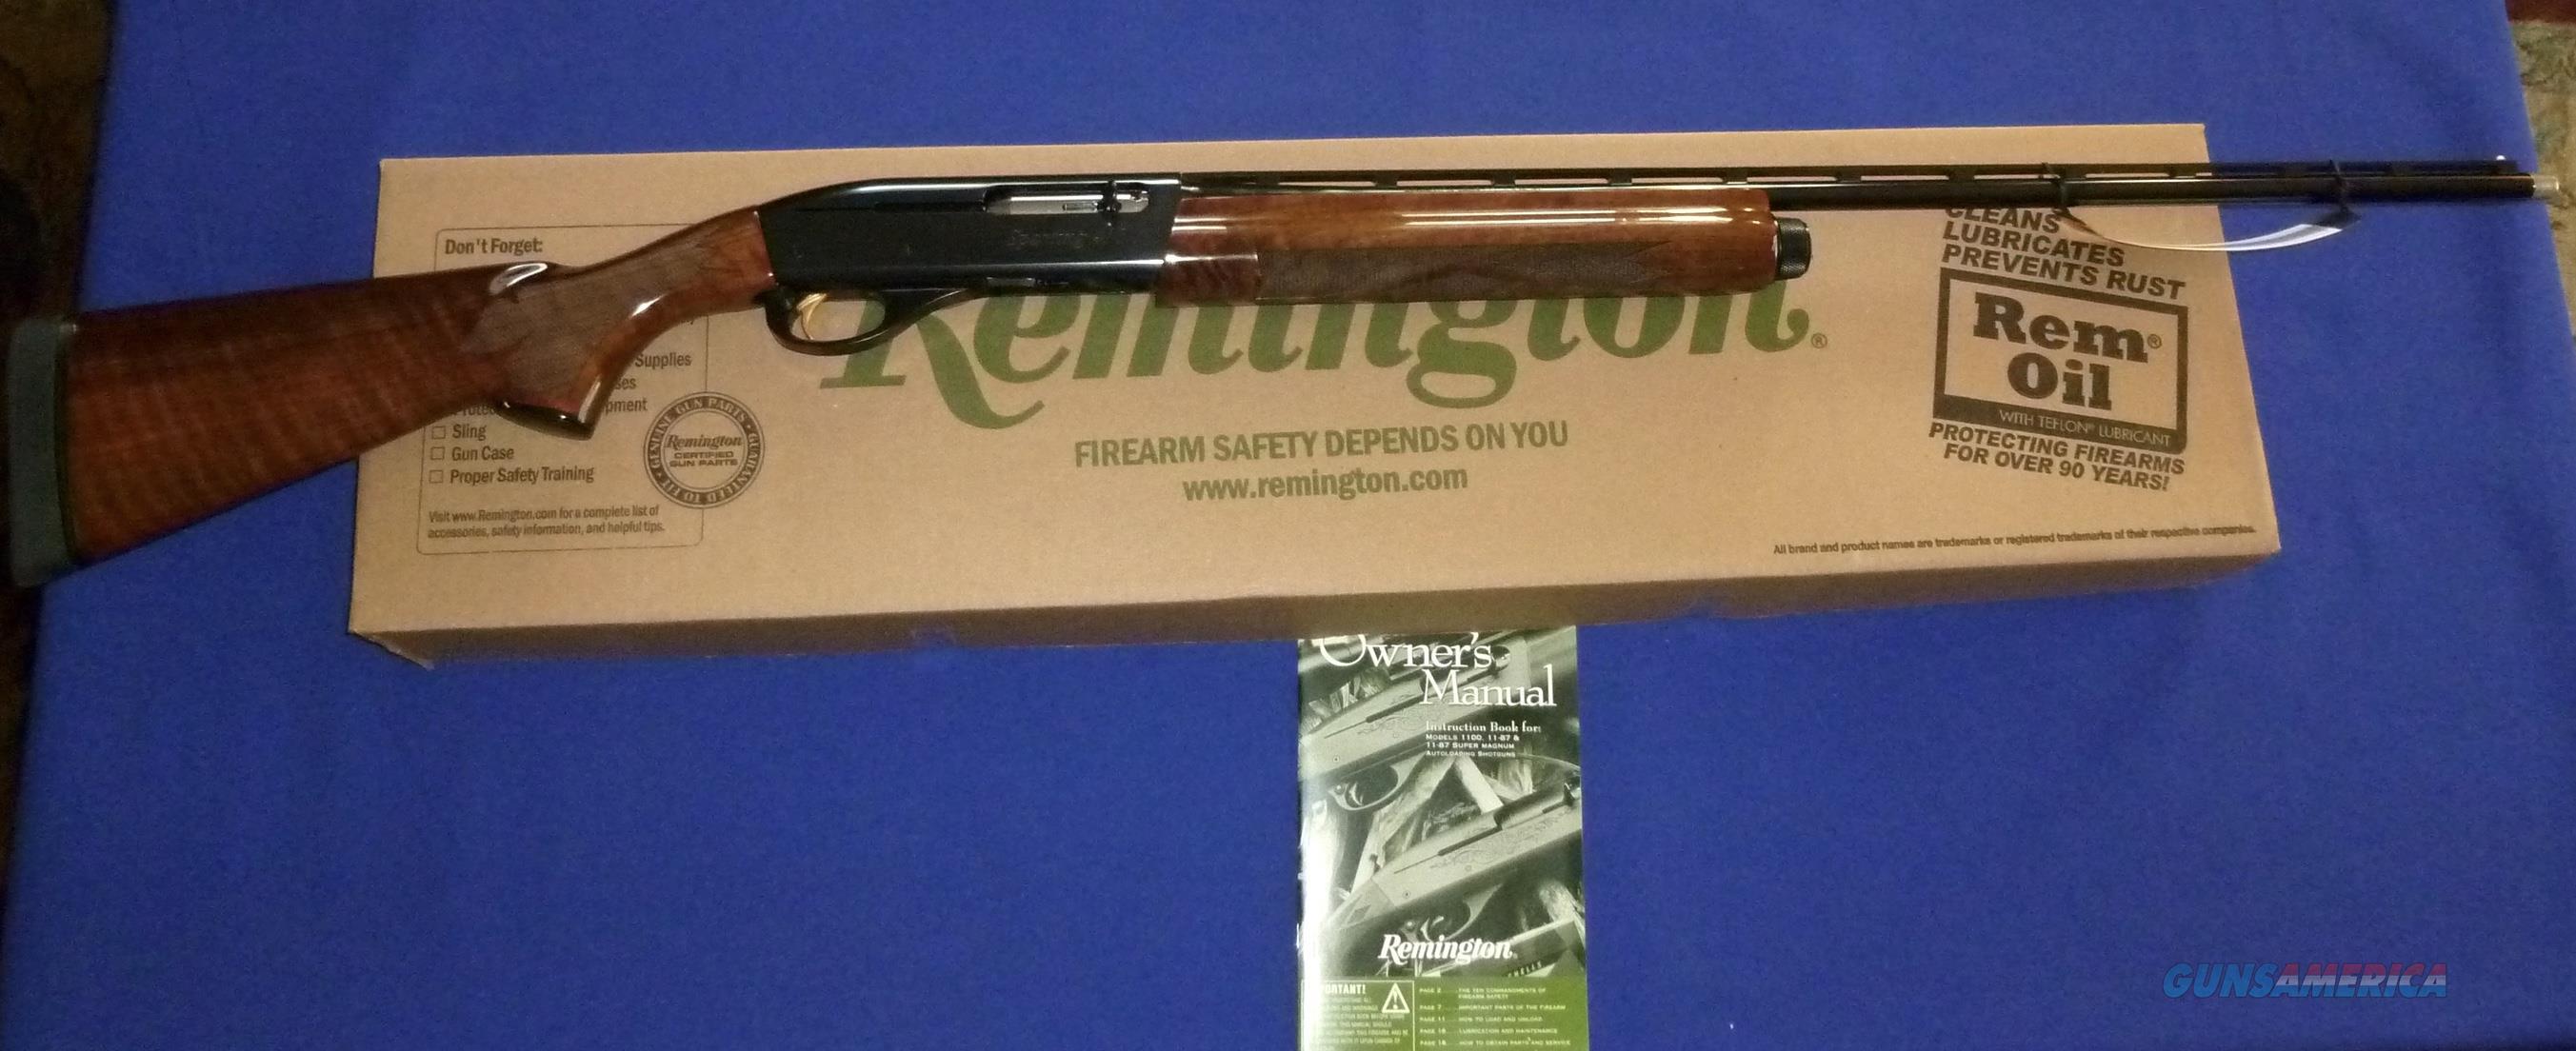 Semi Automatic Shotgun Remington 1100 Lt 20 Special Field World39s Largest Supplier Of Firearm